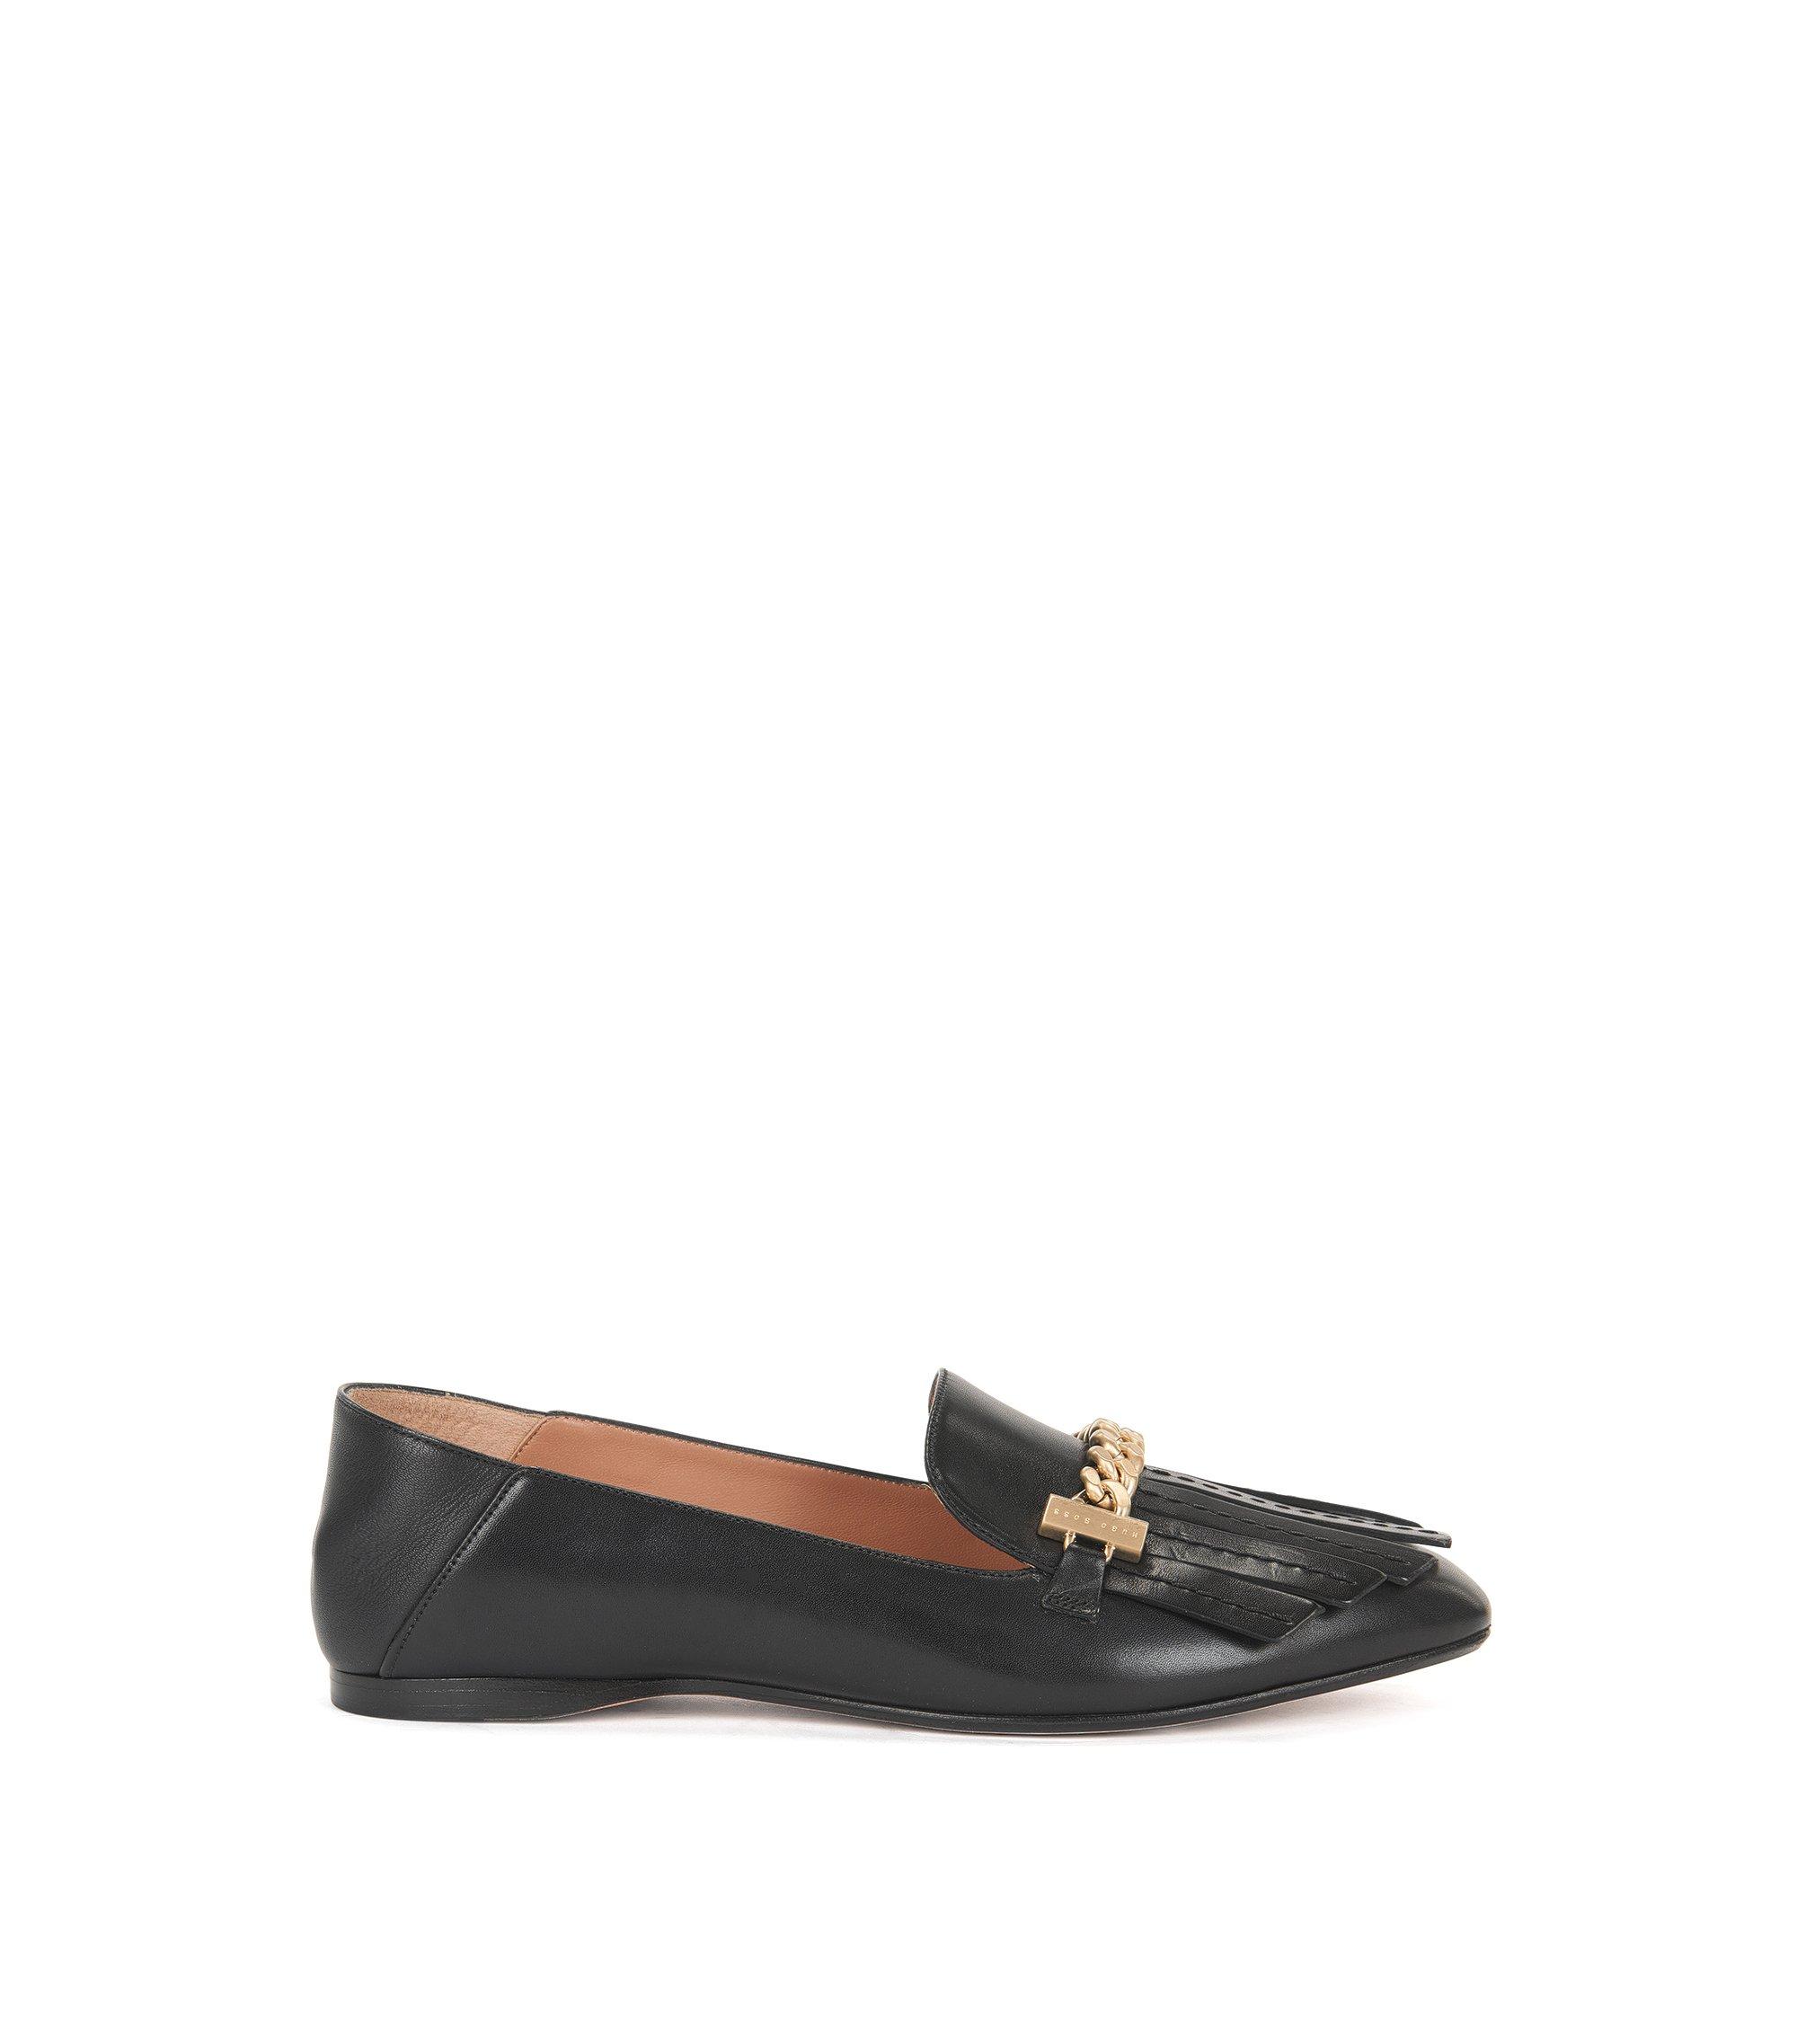 Fringe-trim loafers in Italian leather, Black